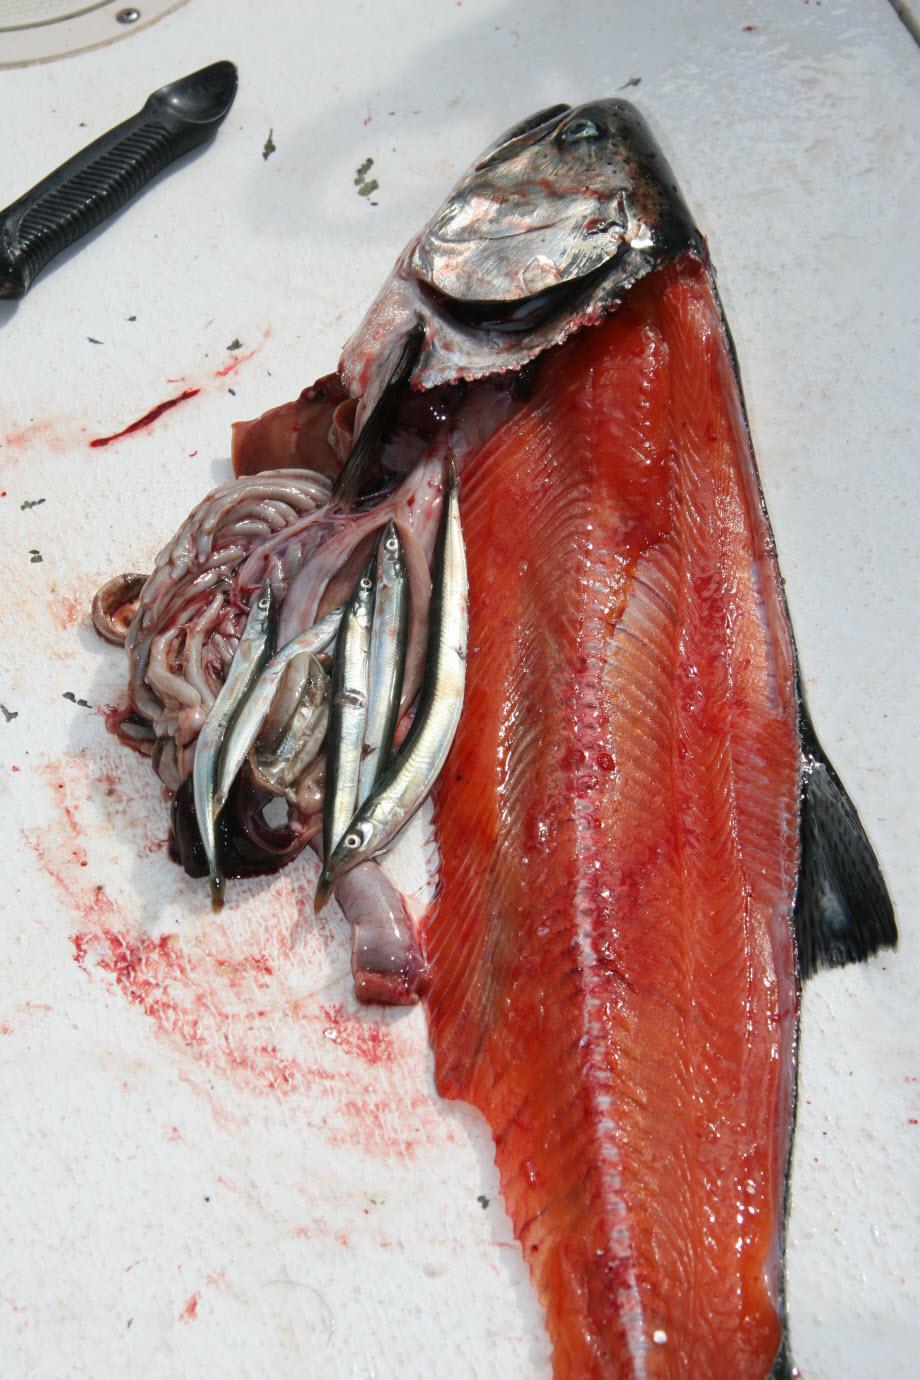 WestCoastFish0625